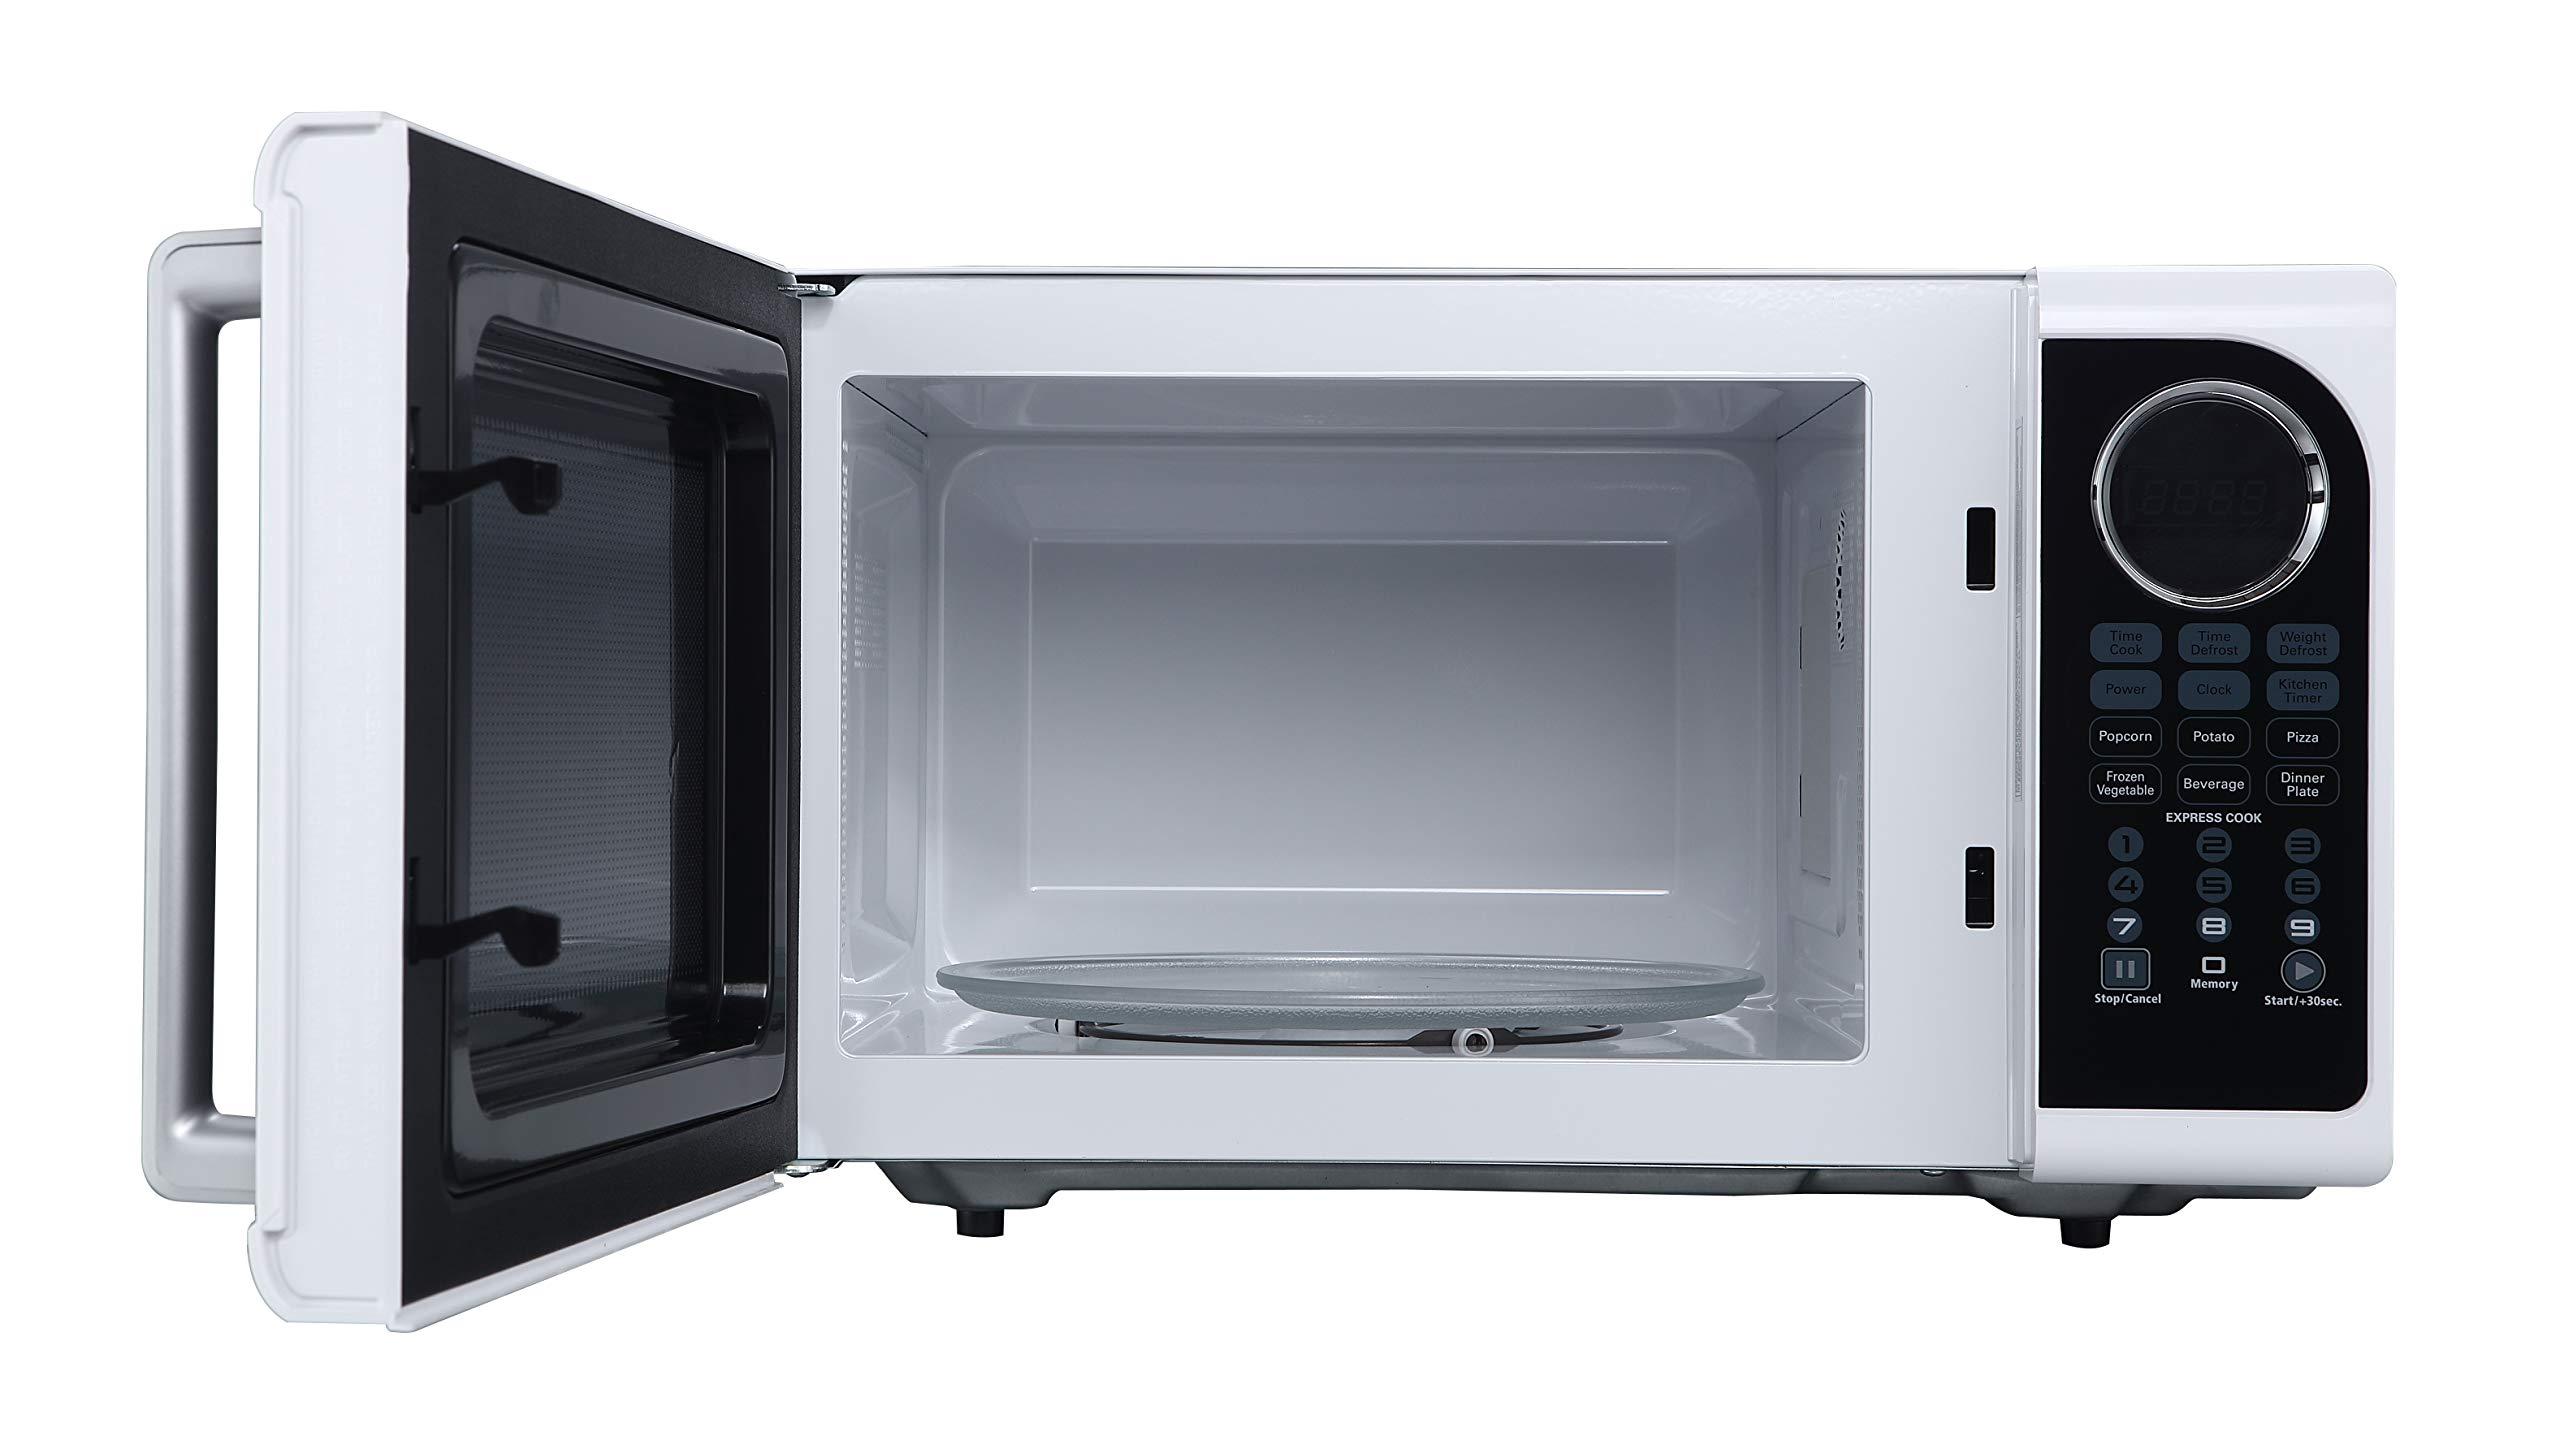 Black+Decker EM925ACP-P1 0.9 Cu. Ft. Digital Microwave, White by BLACK+DECKER (Image #4)